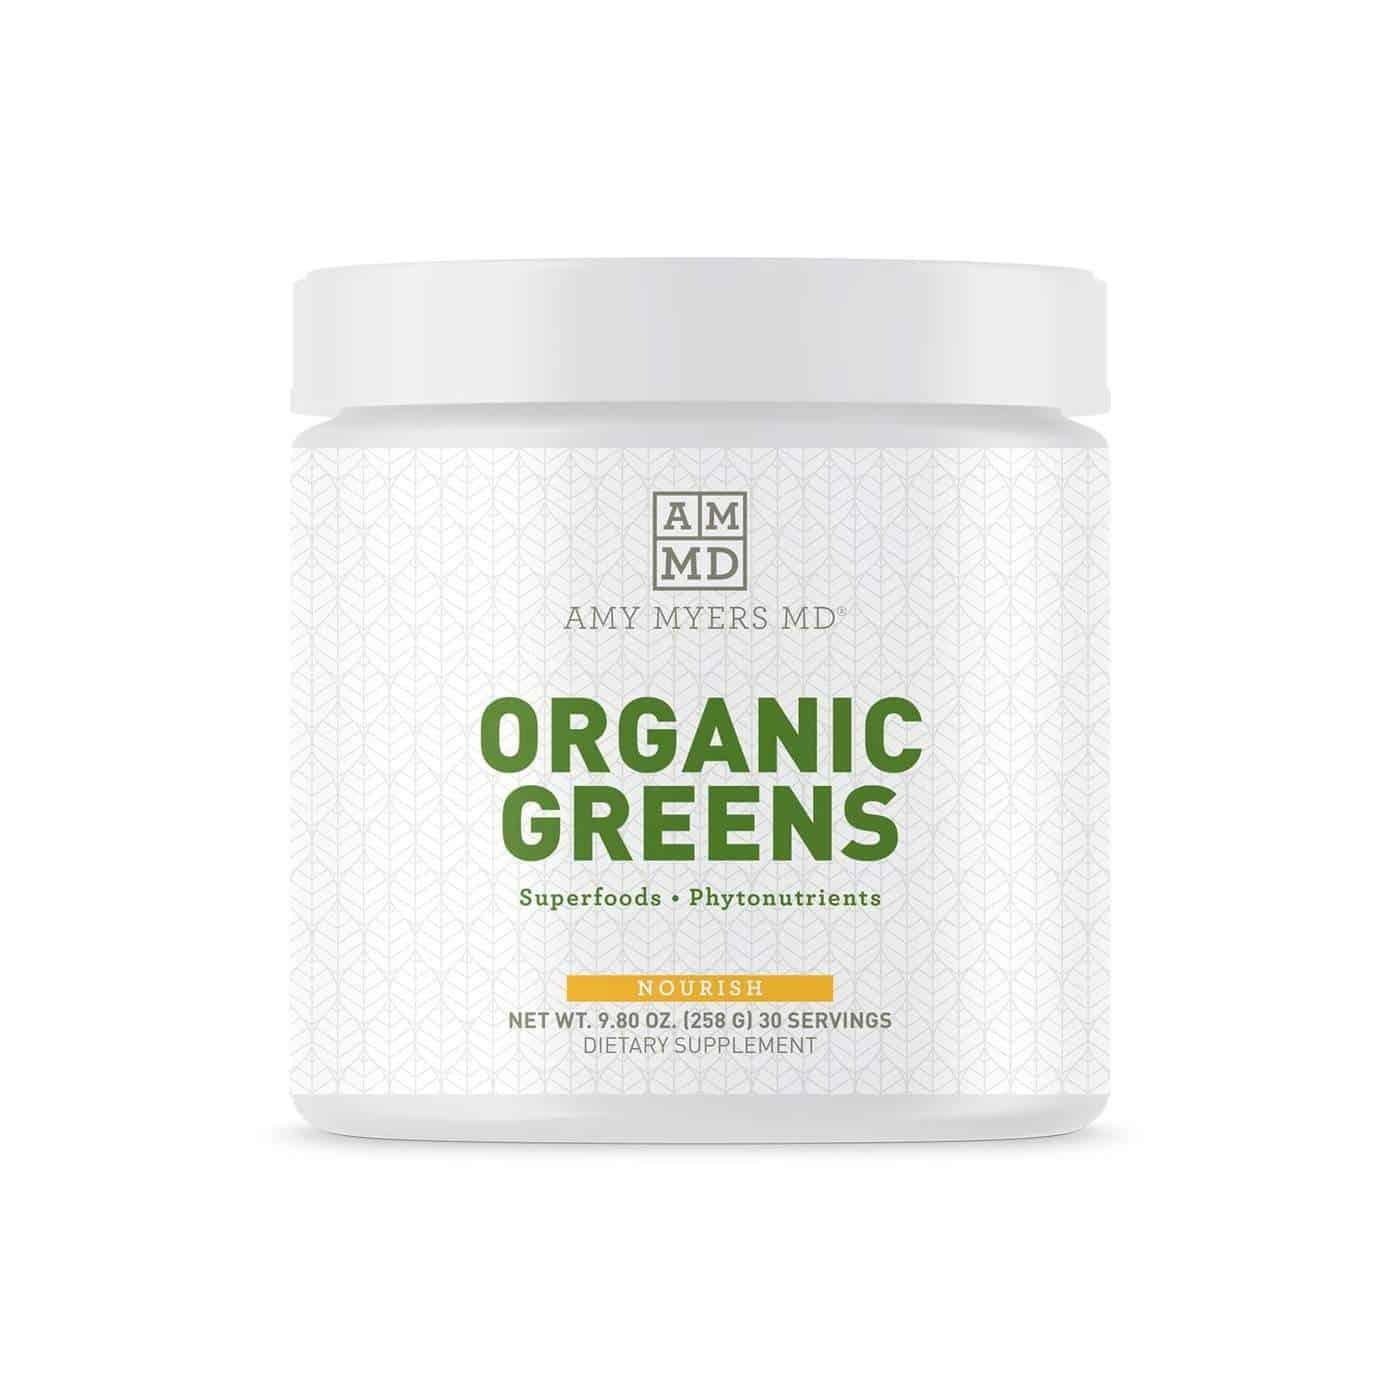 orgnaic greens supplement